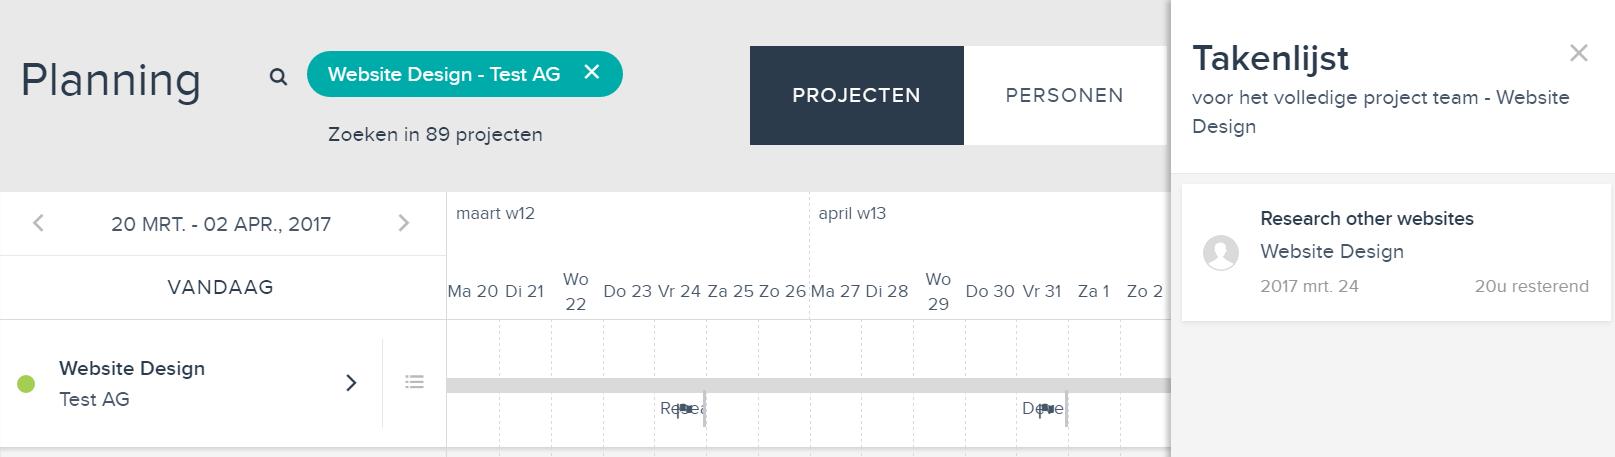 project planning: takenlijst